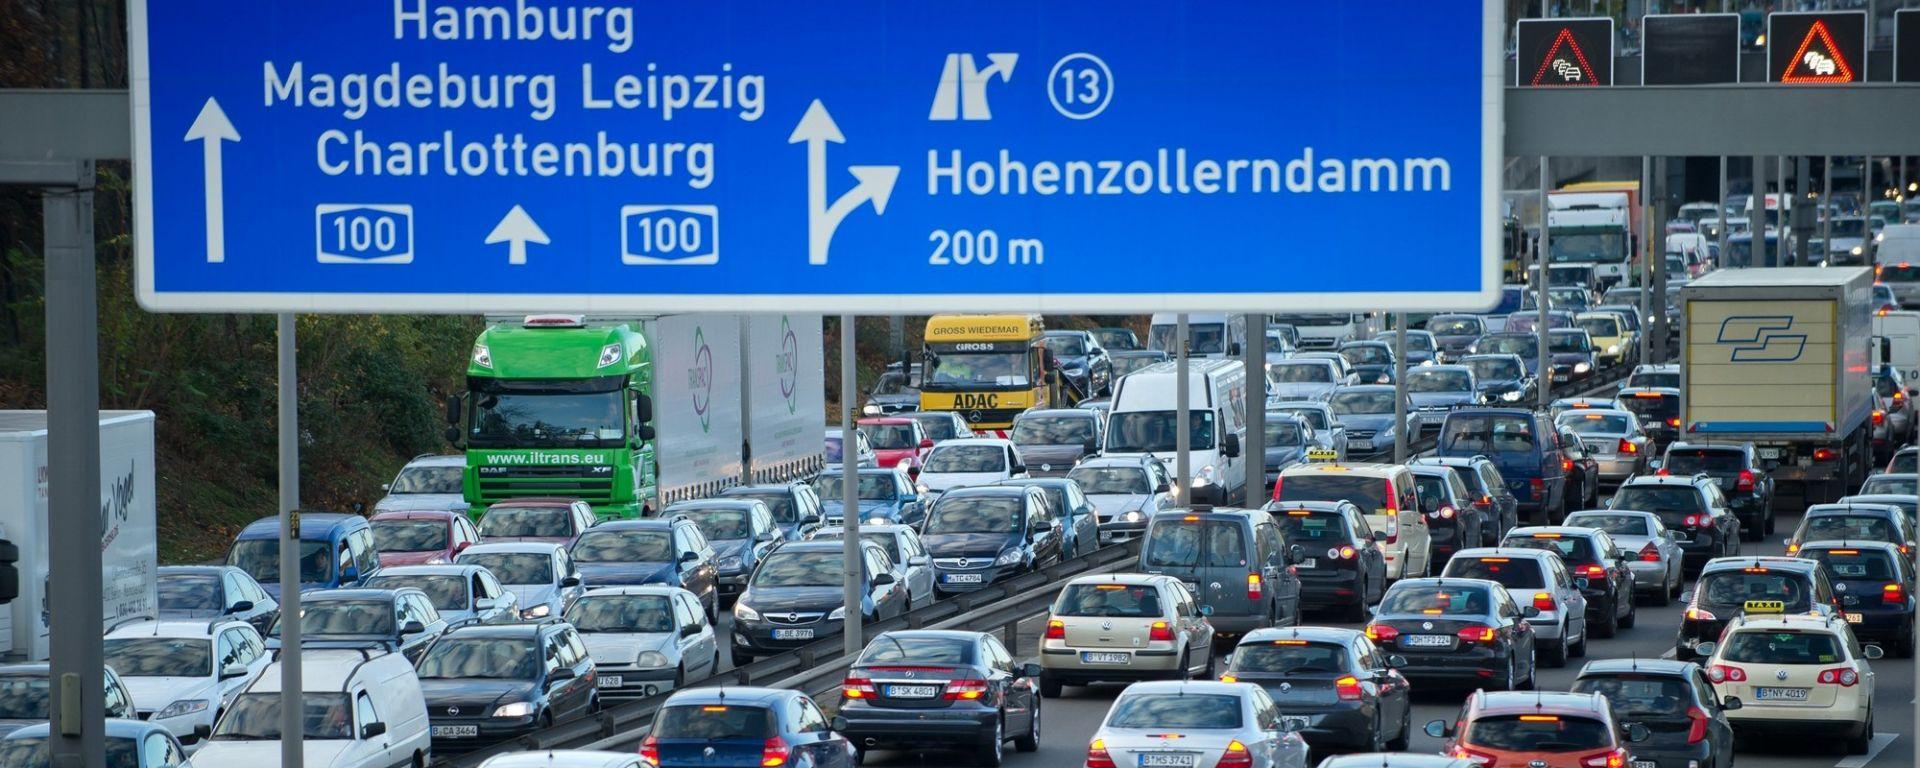 Guerra alle auto diesel, le città tedesche si preparano